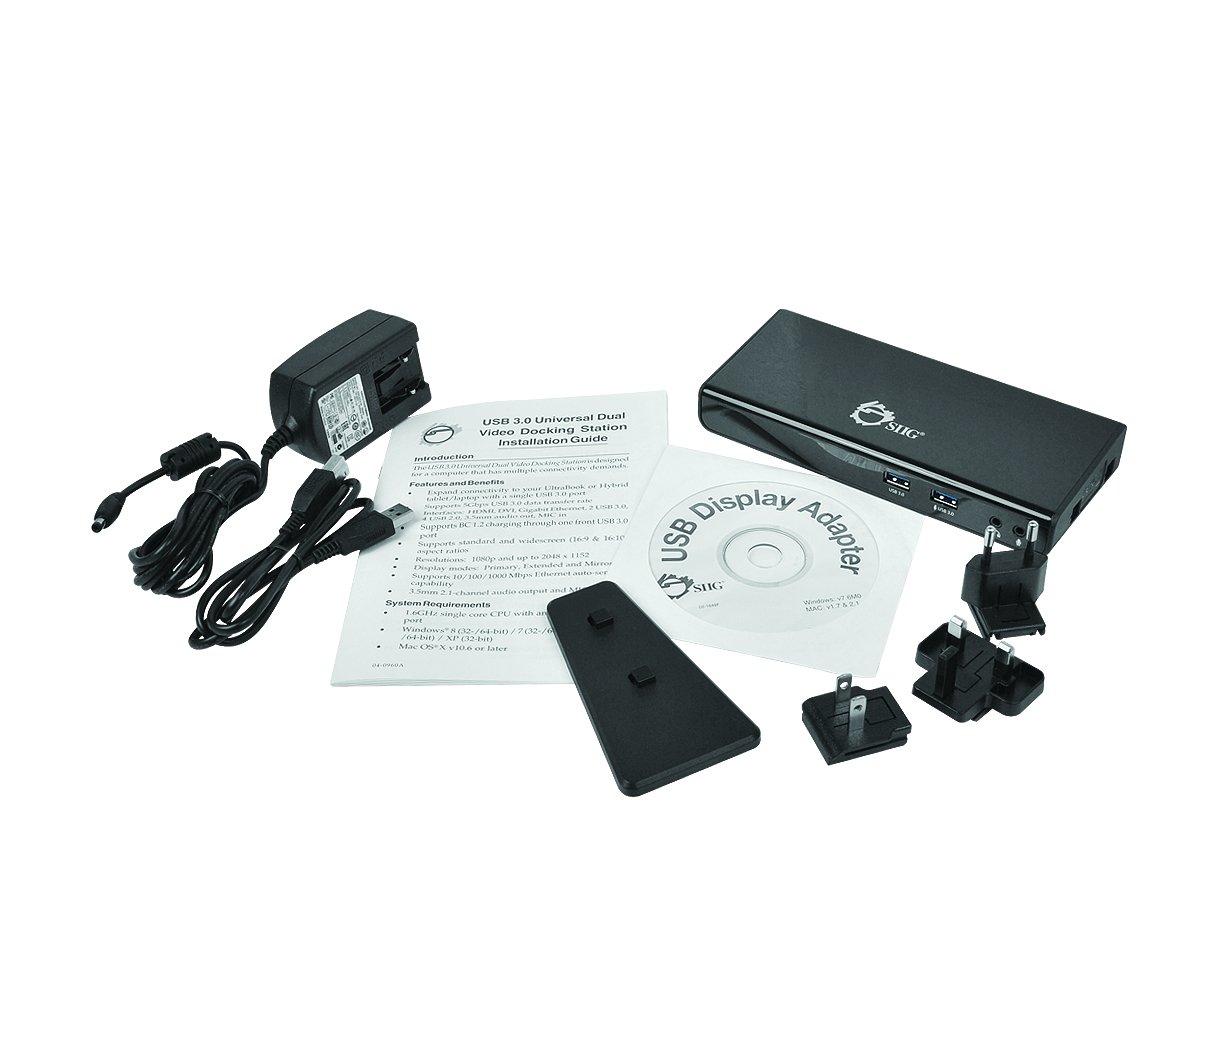 SIIG USB 3.0 Dual Video Docking Station -JU-DK0211-S1, For Windows & Mac - HDMI & DVI Dual Video Outputs, Gigabit Ethernet, Audio / Mic, 6 USB Ports, 512MB Built-in Video RAM